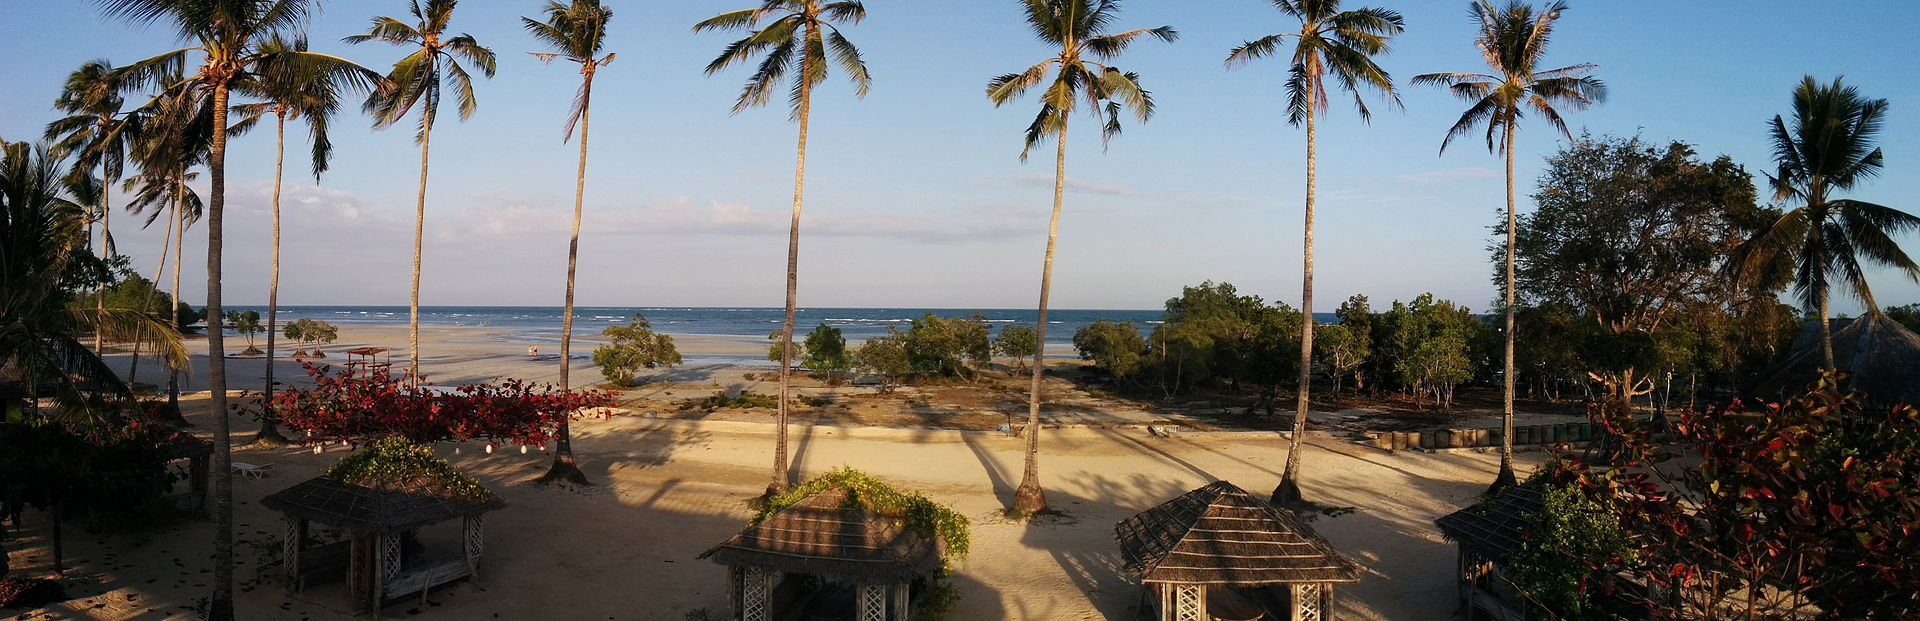 Puerto Princesa - The Emerald Beach and Nature Park.jpg